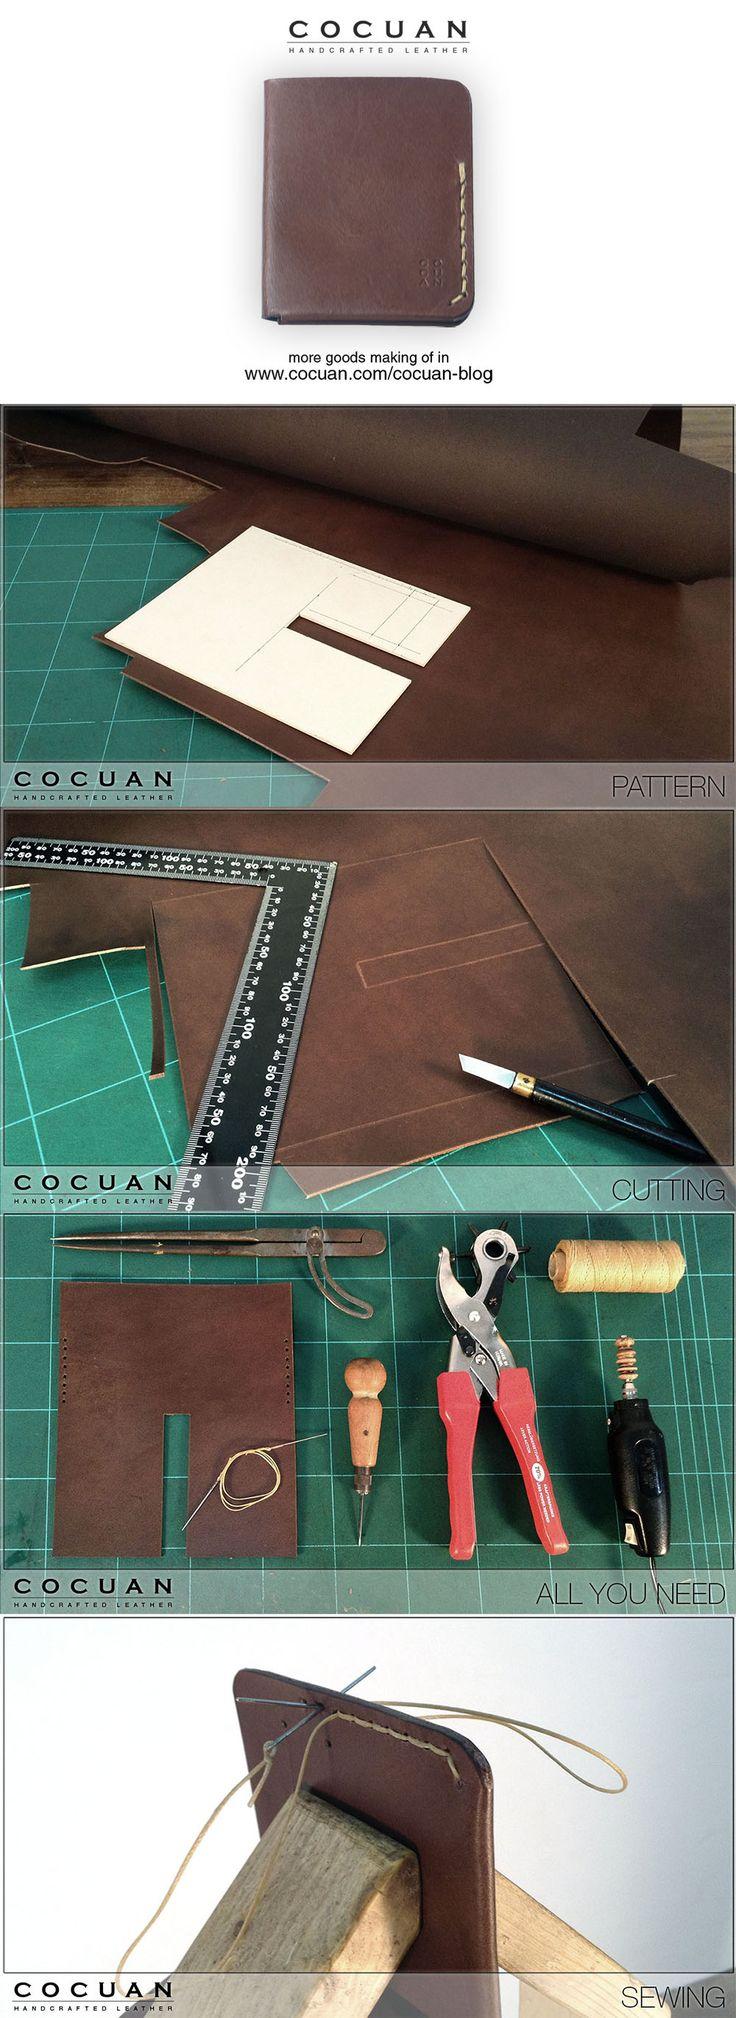 Bifold wallet making of www.cocuan.com